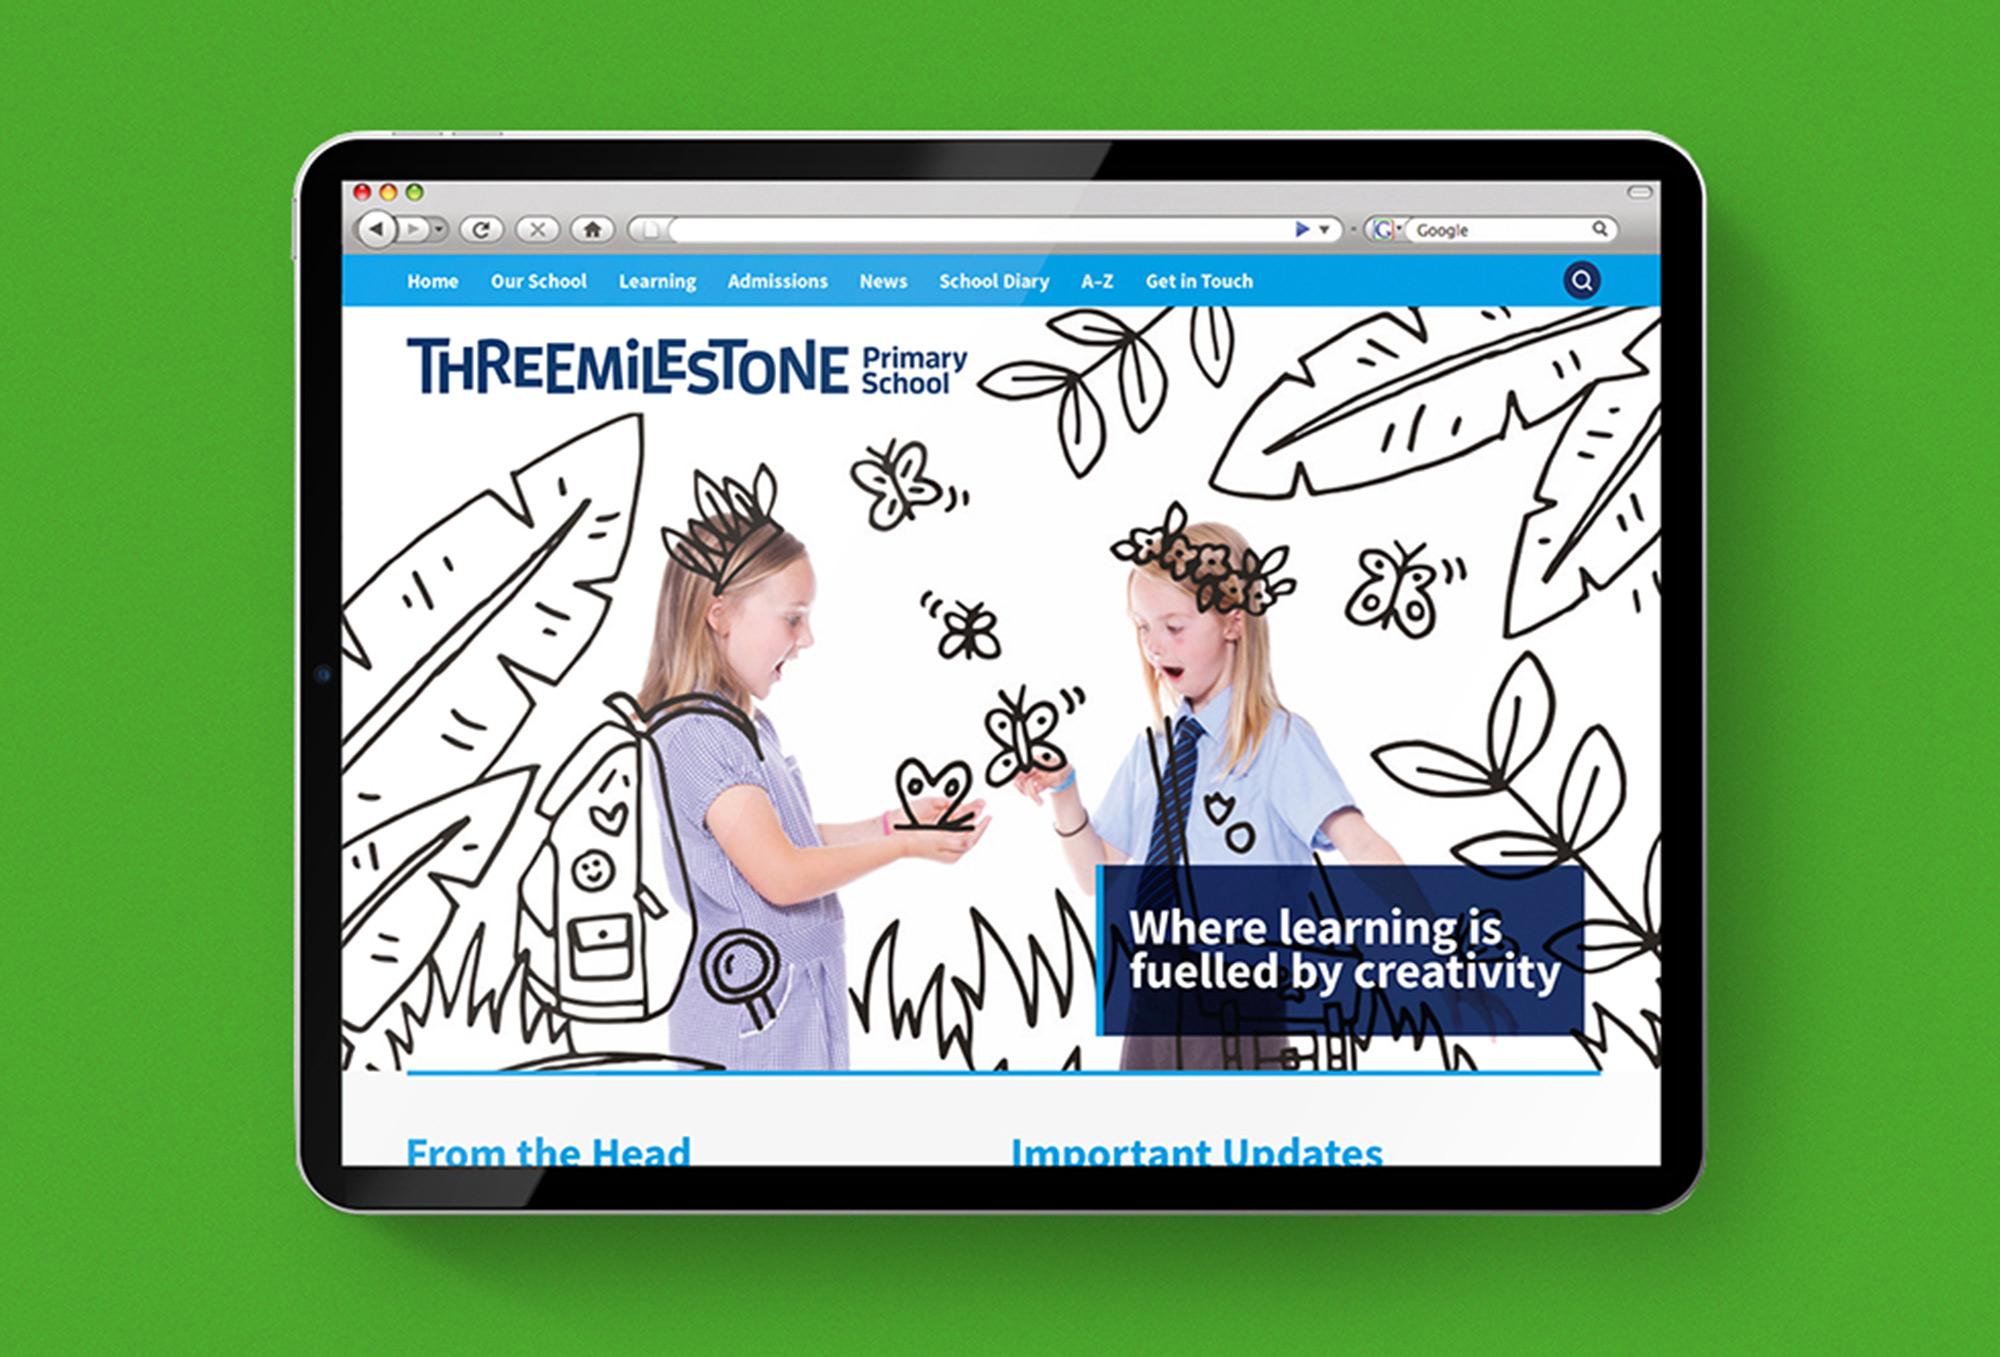 Threemilestone School branding